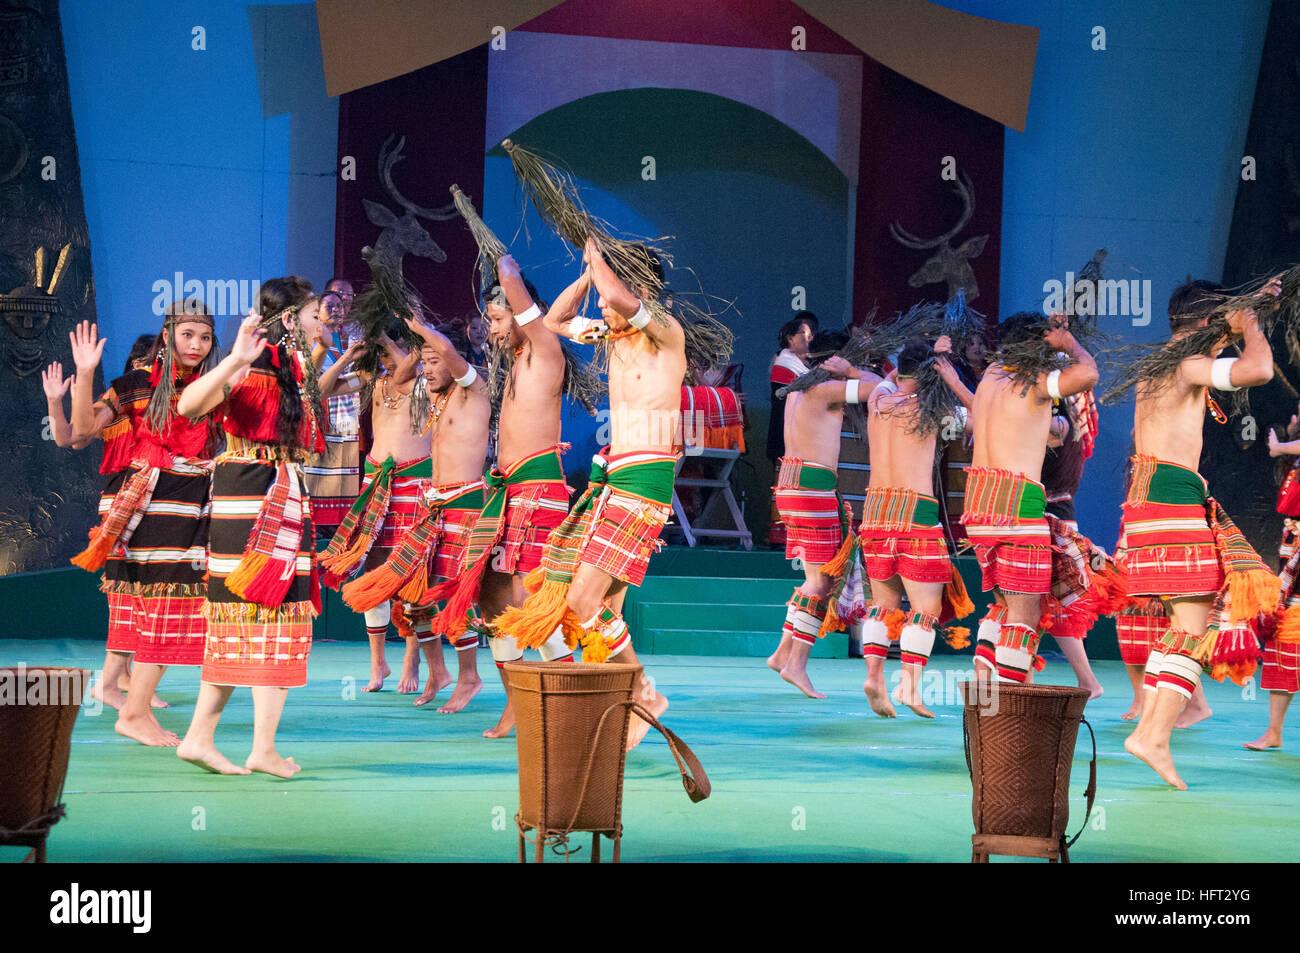 Manipur tribal dancers perform at the Sangai Festival, Imphal, India - Stock Image